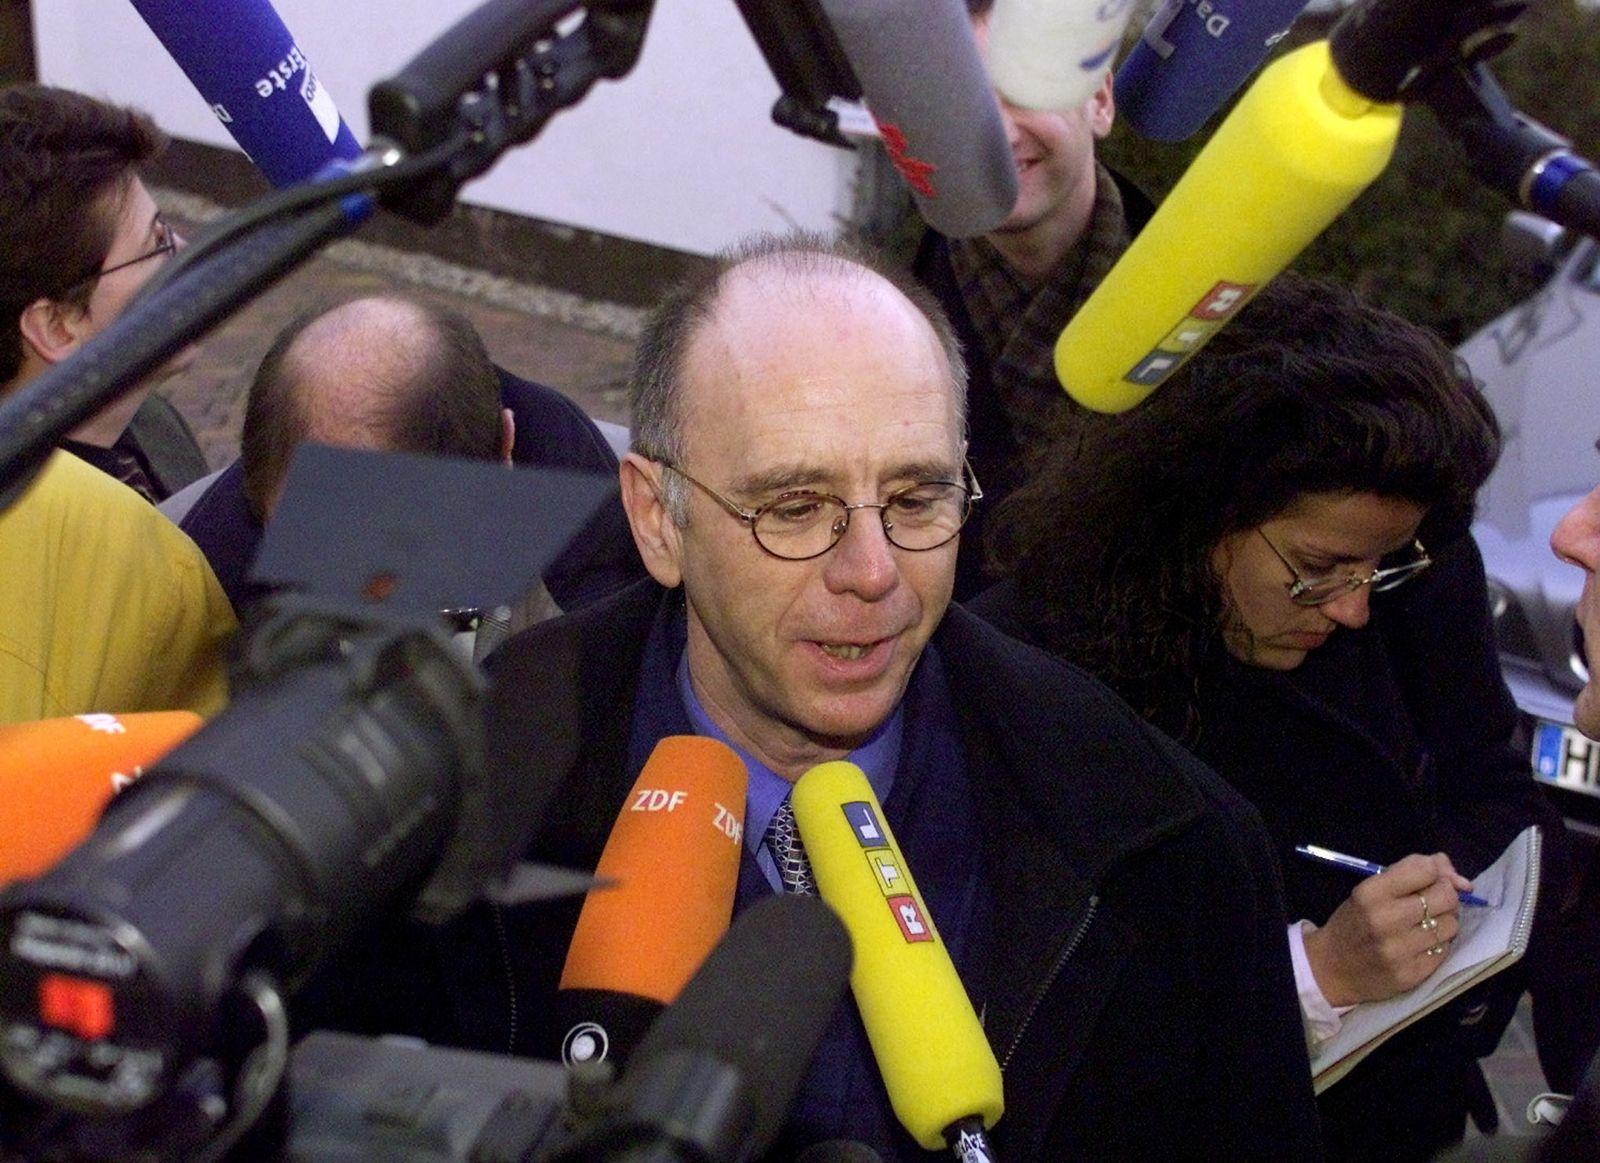 Walter Riester